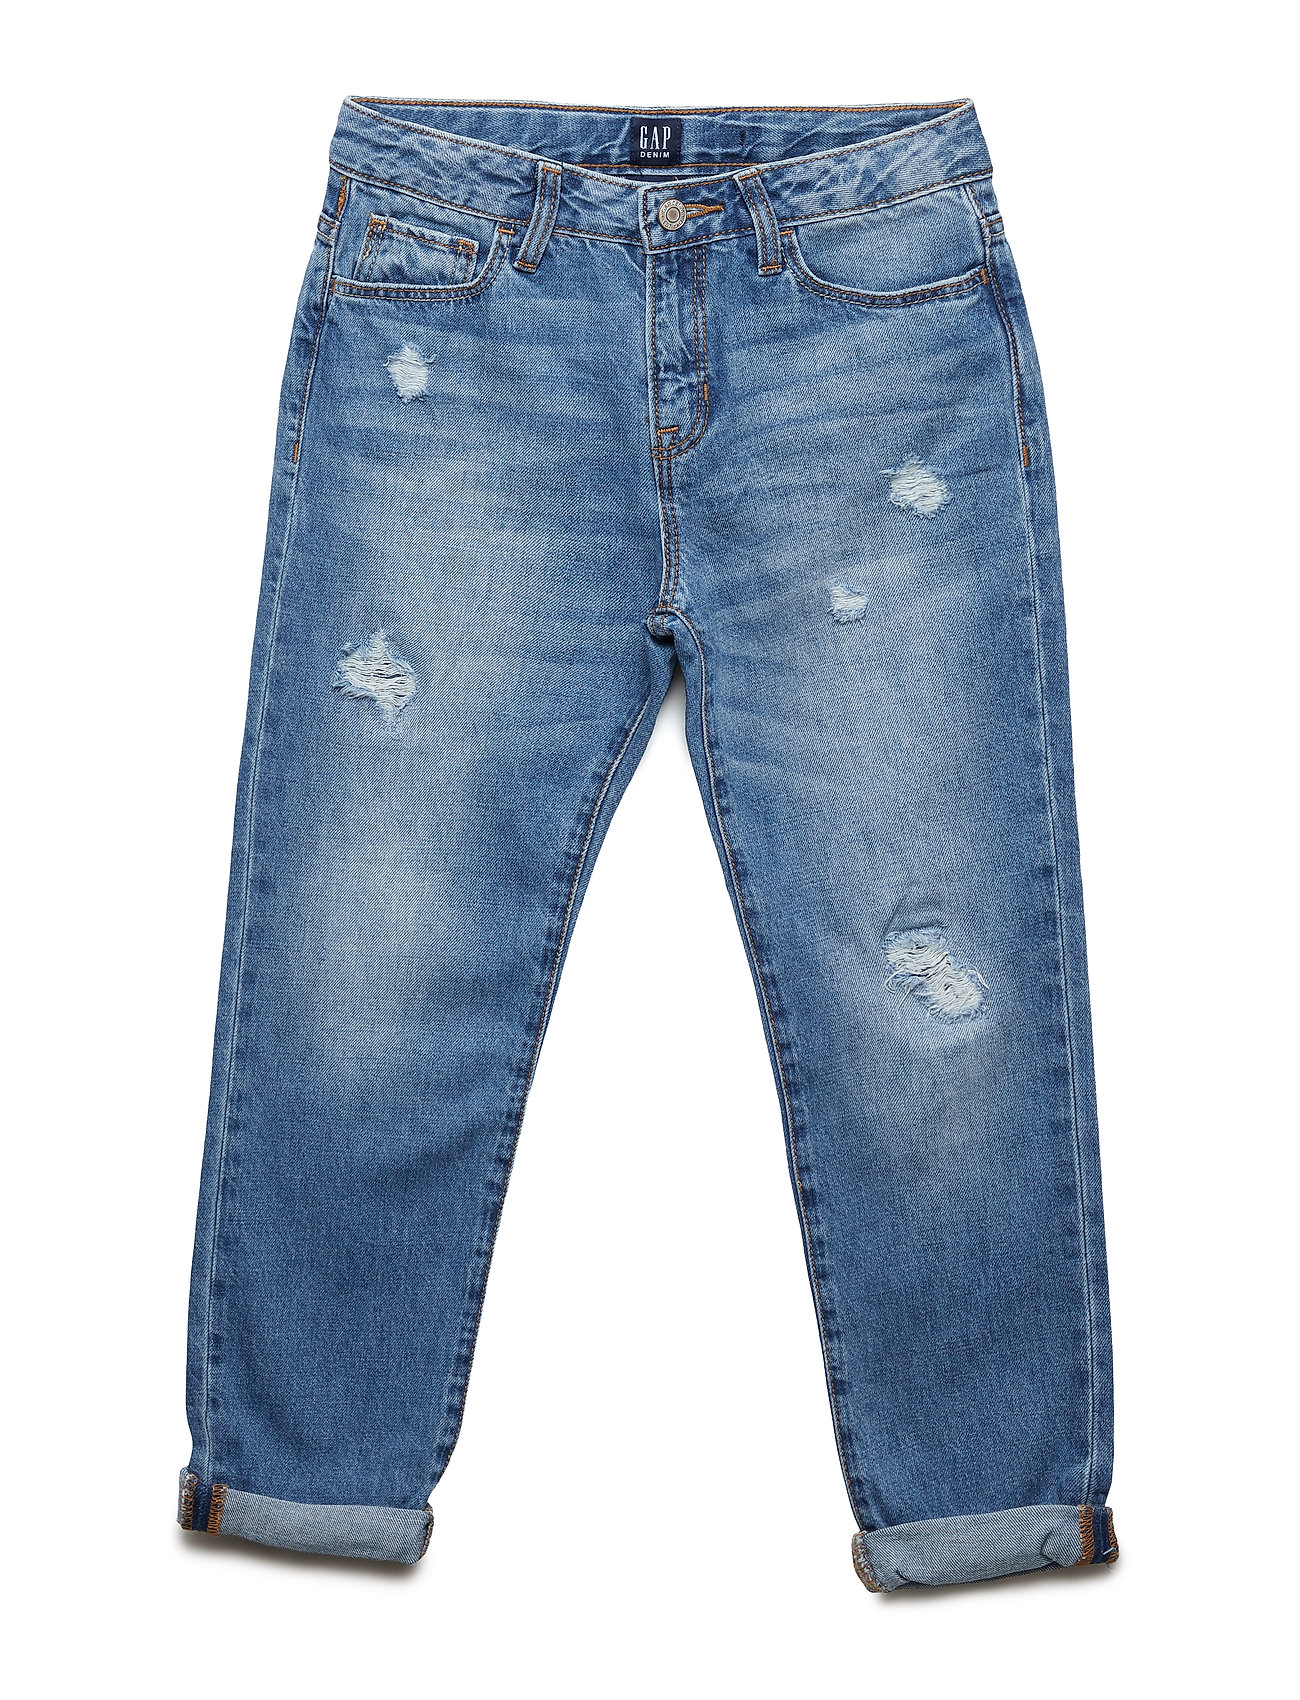 GAP Kids Destructed Girlfriend Jeans - MEDIUM WASH